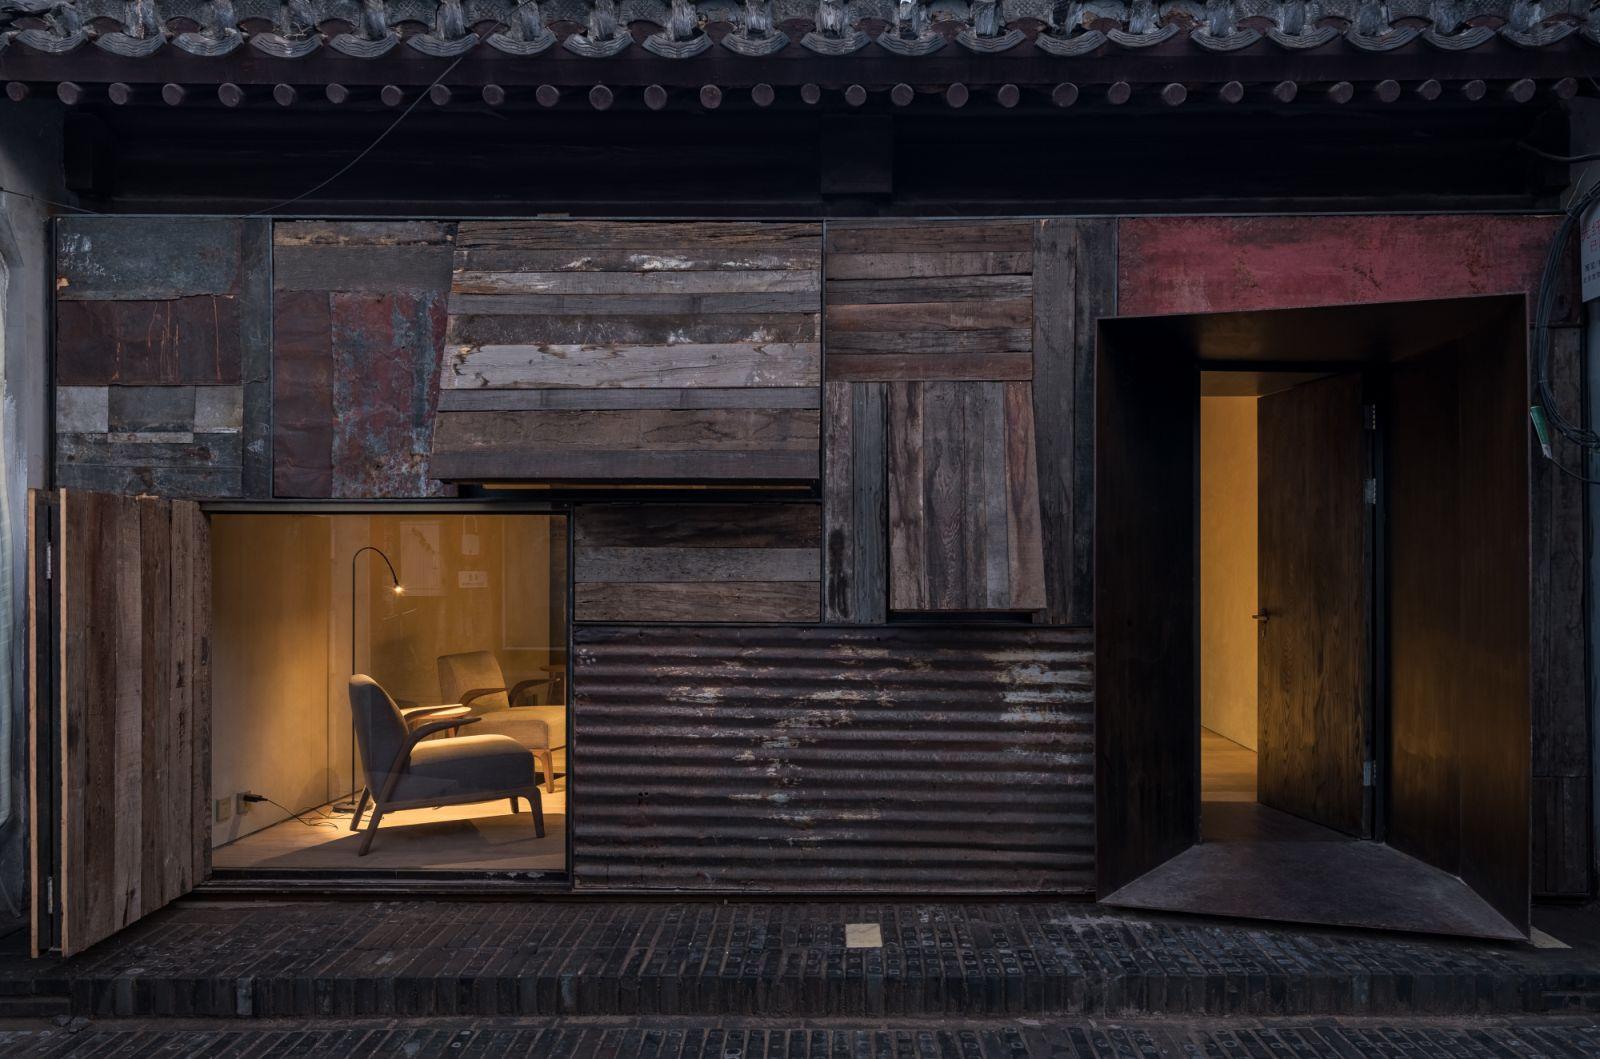 Micro Hutong in Beijing